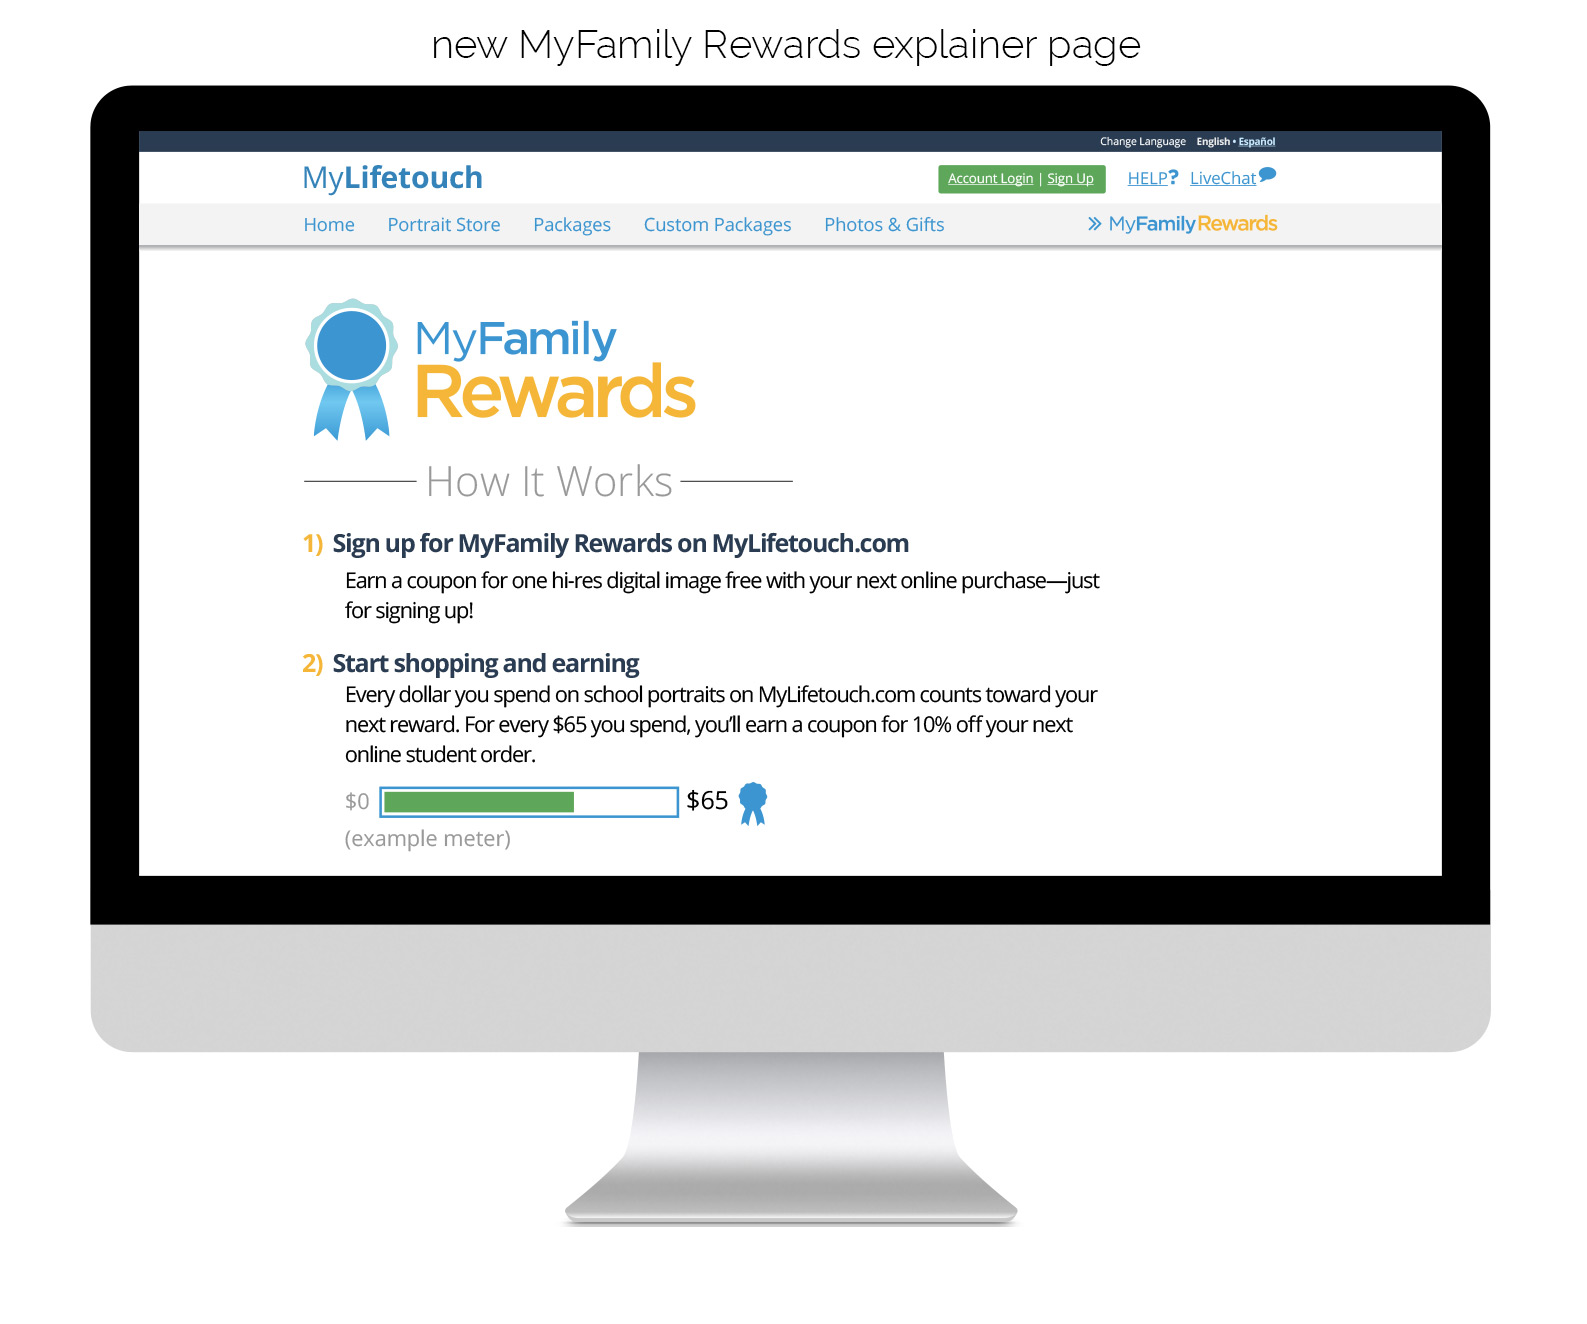 Rewards - How It Works